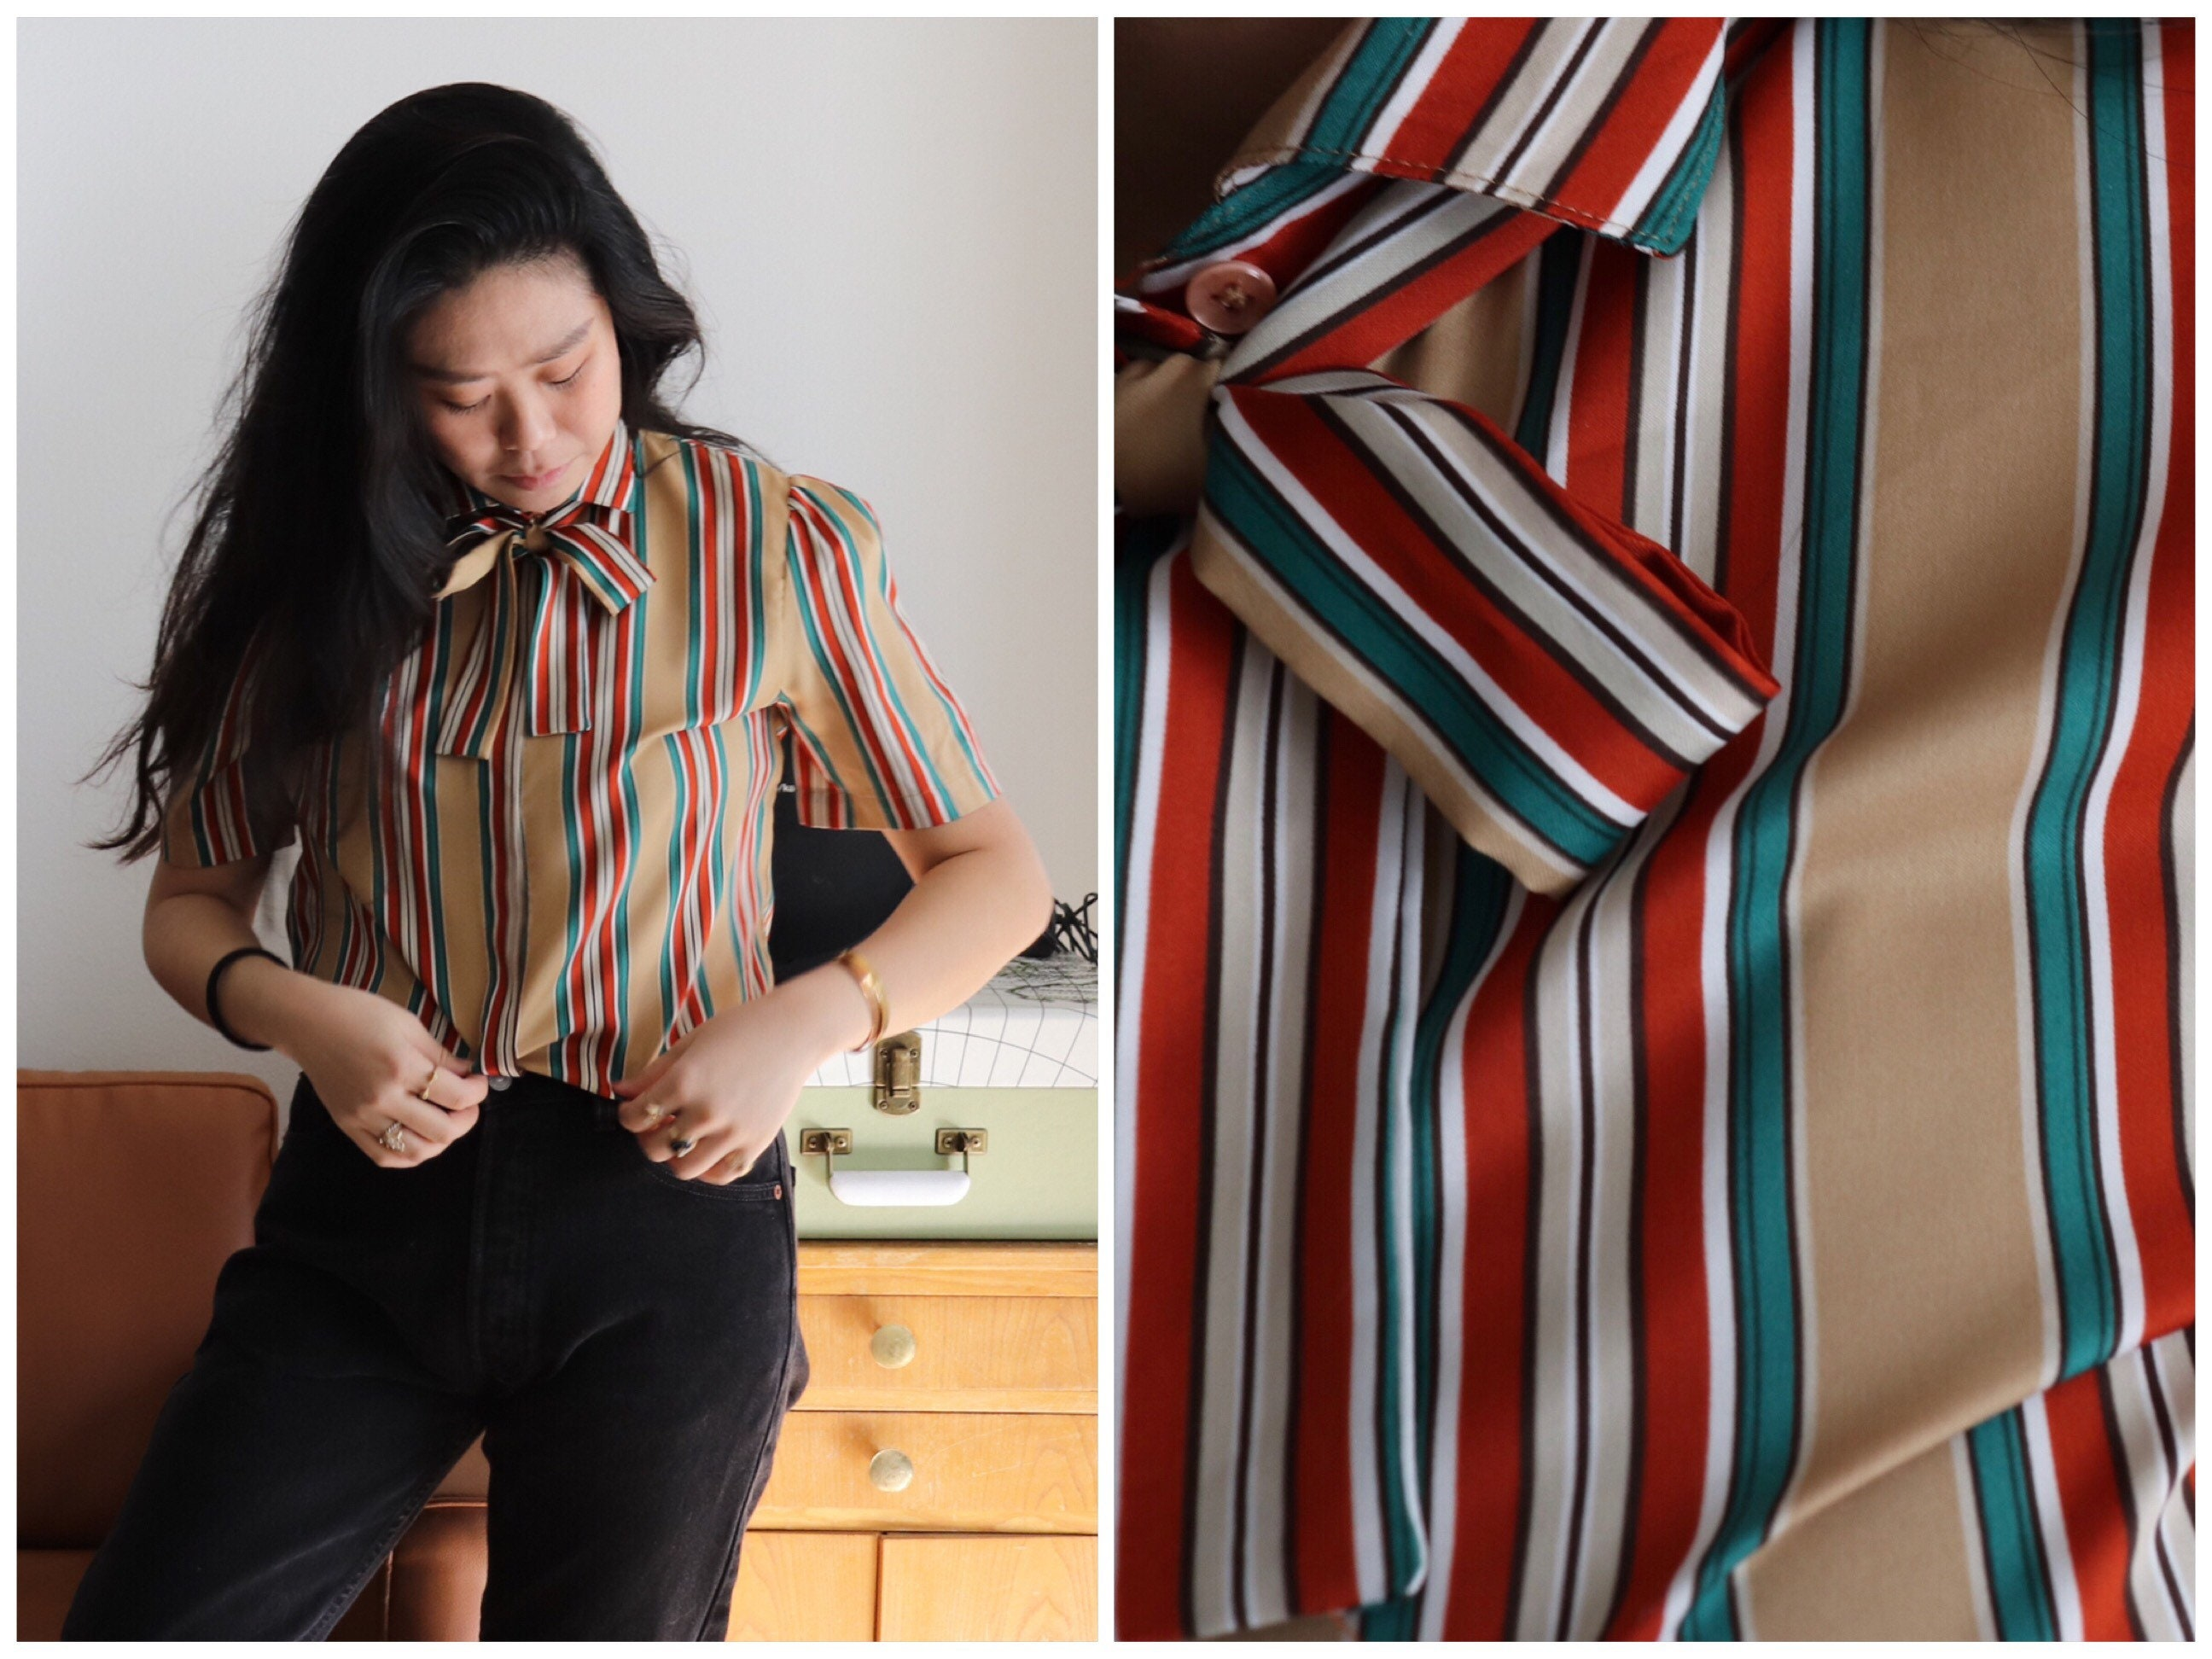 Vintage Scarf Styles -1920s to 1960s Rare Vintage 70S Multi Color Stripe Levis Short Sleeve Blouse Bow Silk Scarf Shirt Retro Mod Mustard $65.00 AT vintagedancer.com